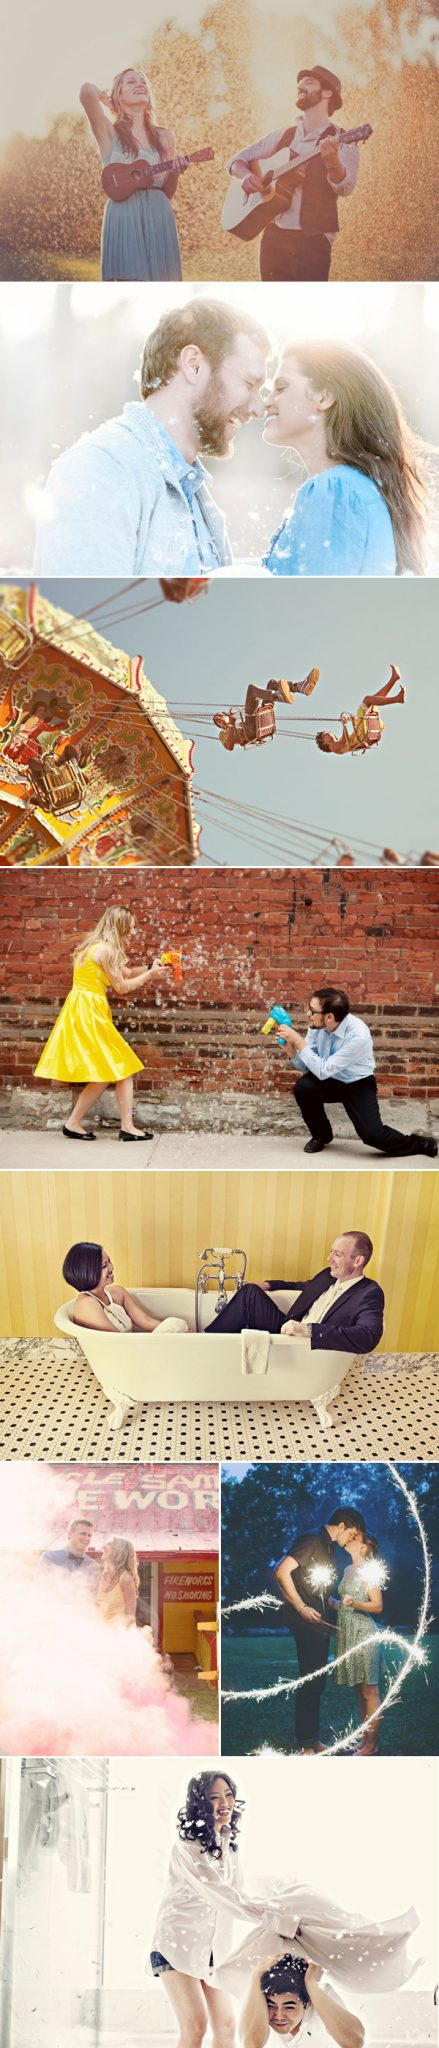 fotos-pre-wedding-ceub-1